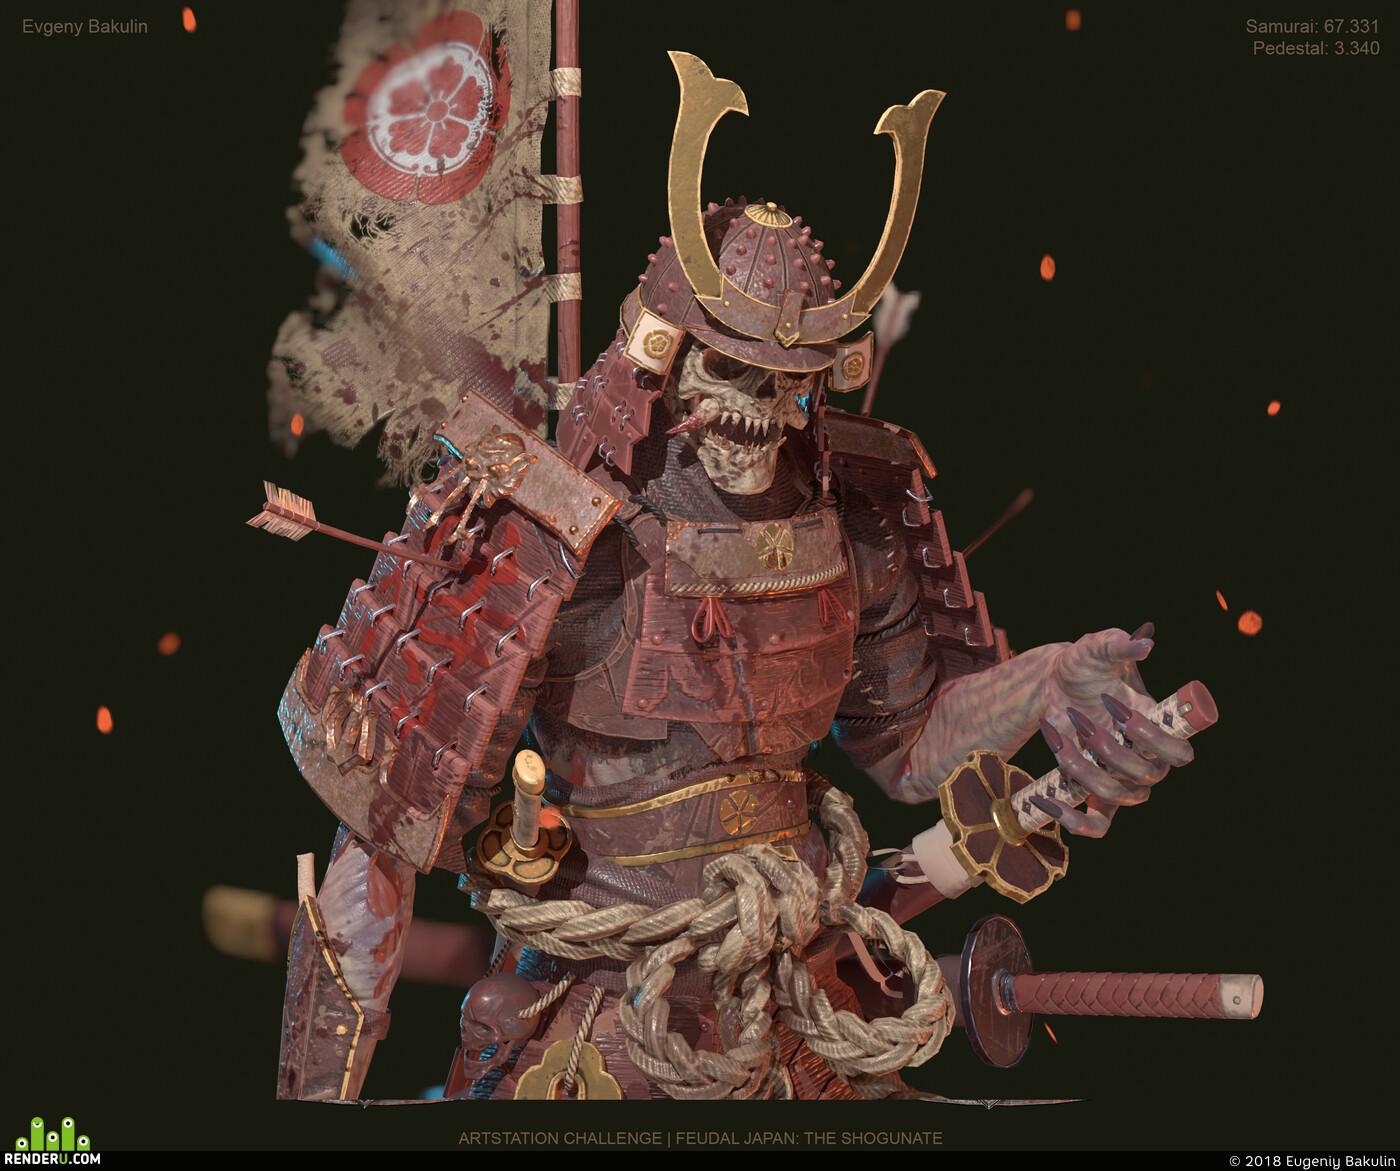 самурай, Япония, мертвец